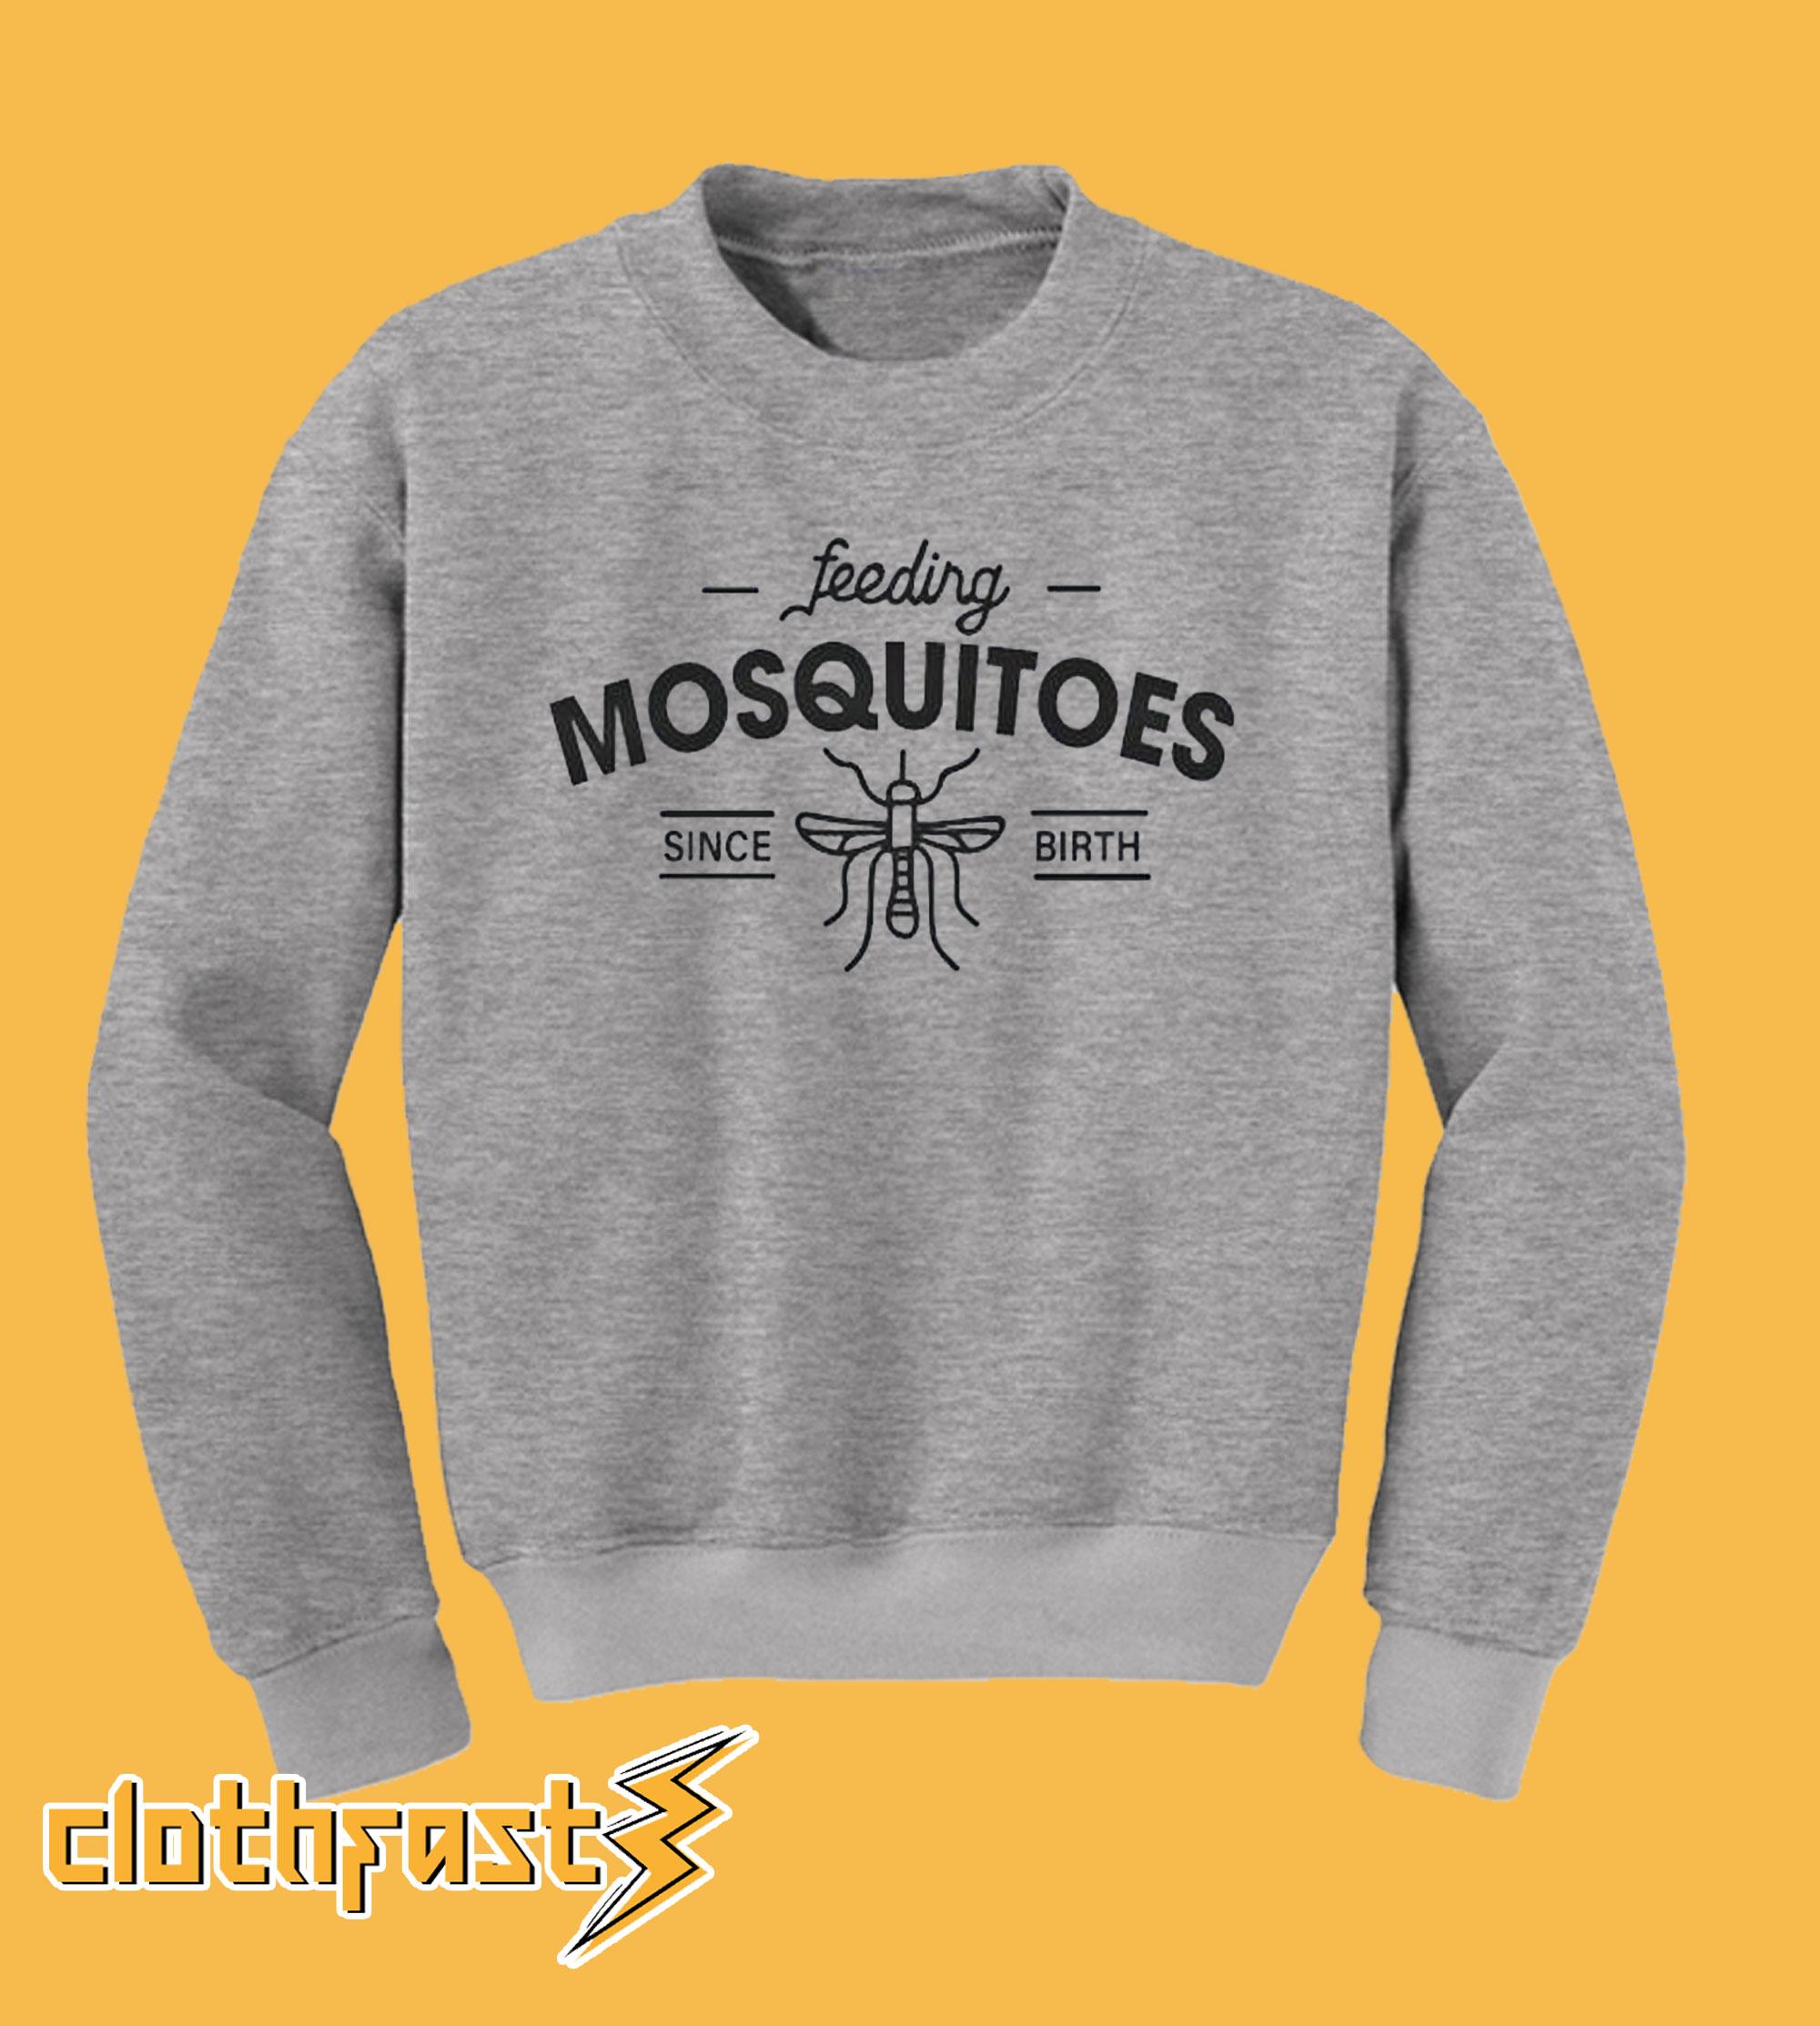 Feeding Misquitos Since Birth Sweatshirt